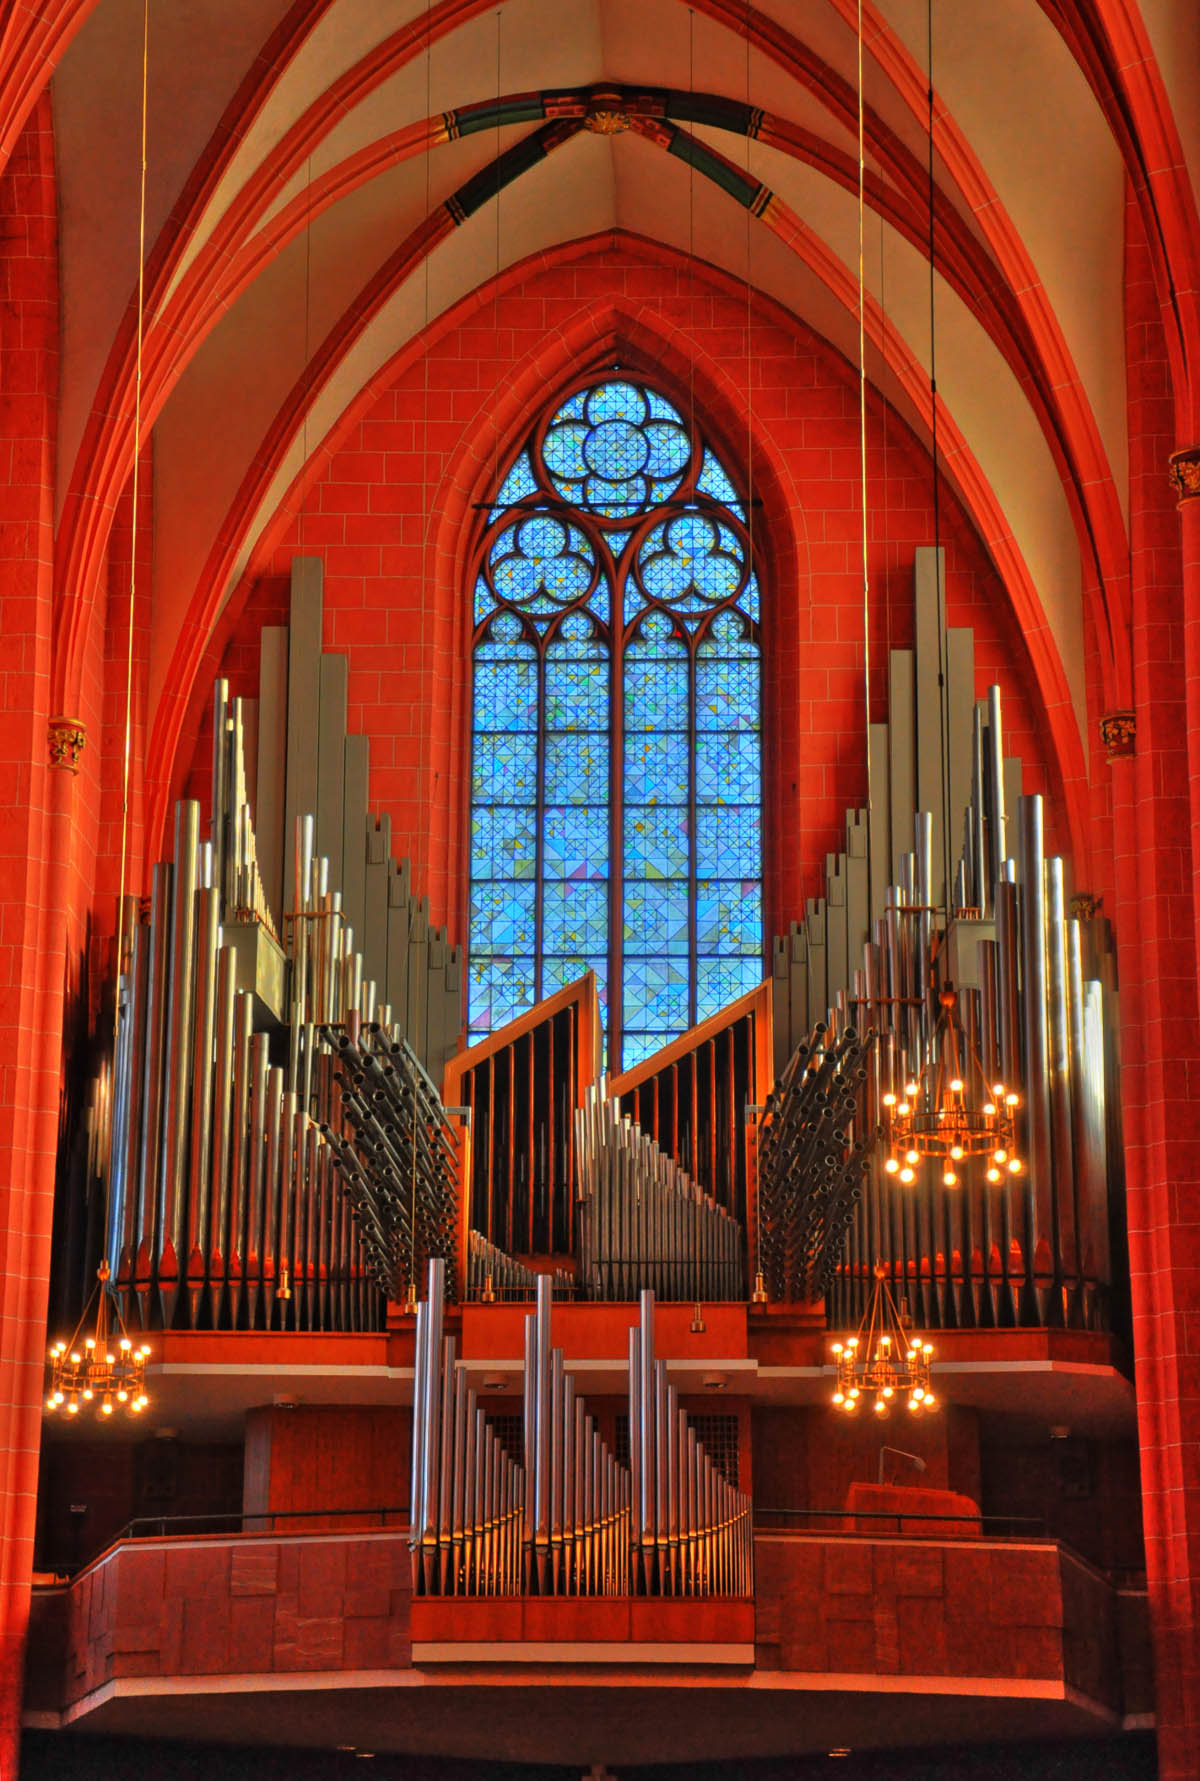 Orgel im Kaiserdom Frankfurt am Main